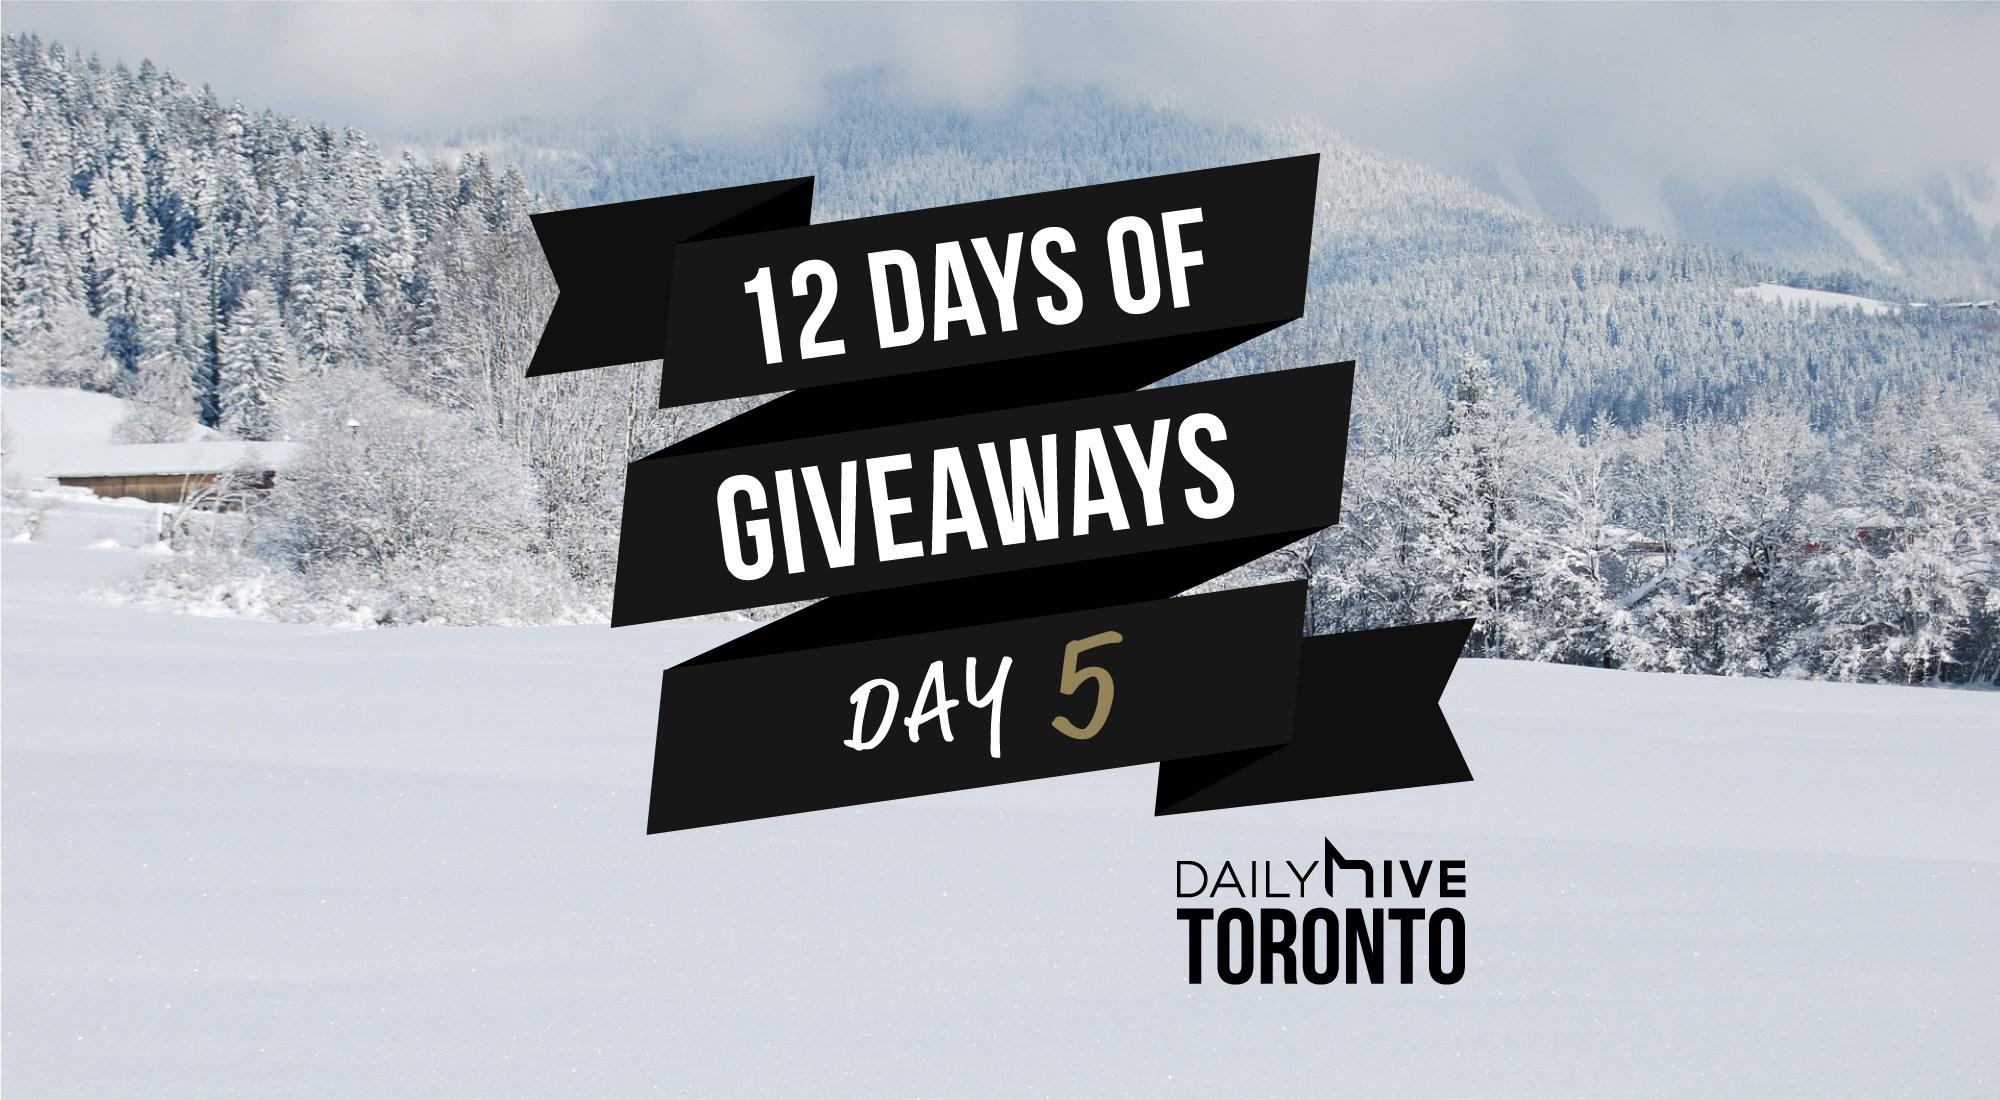 12 days of giveaways toronto 5